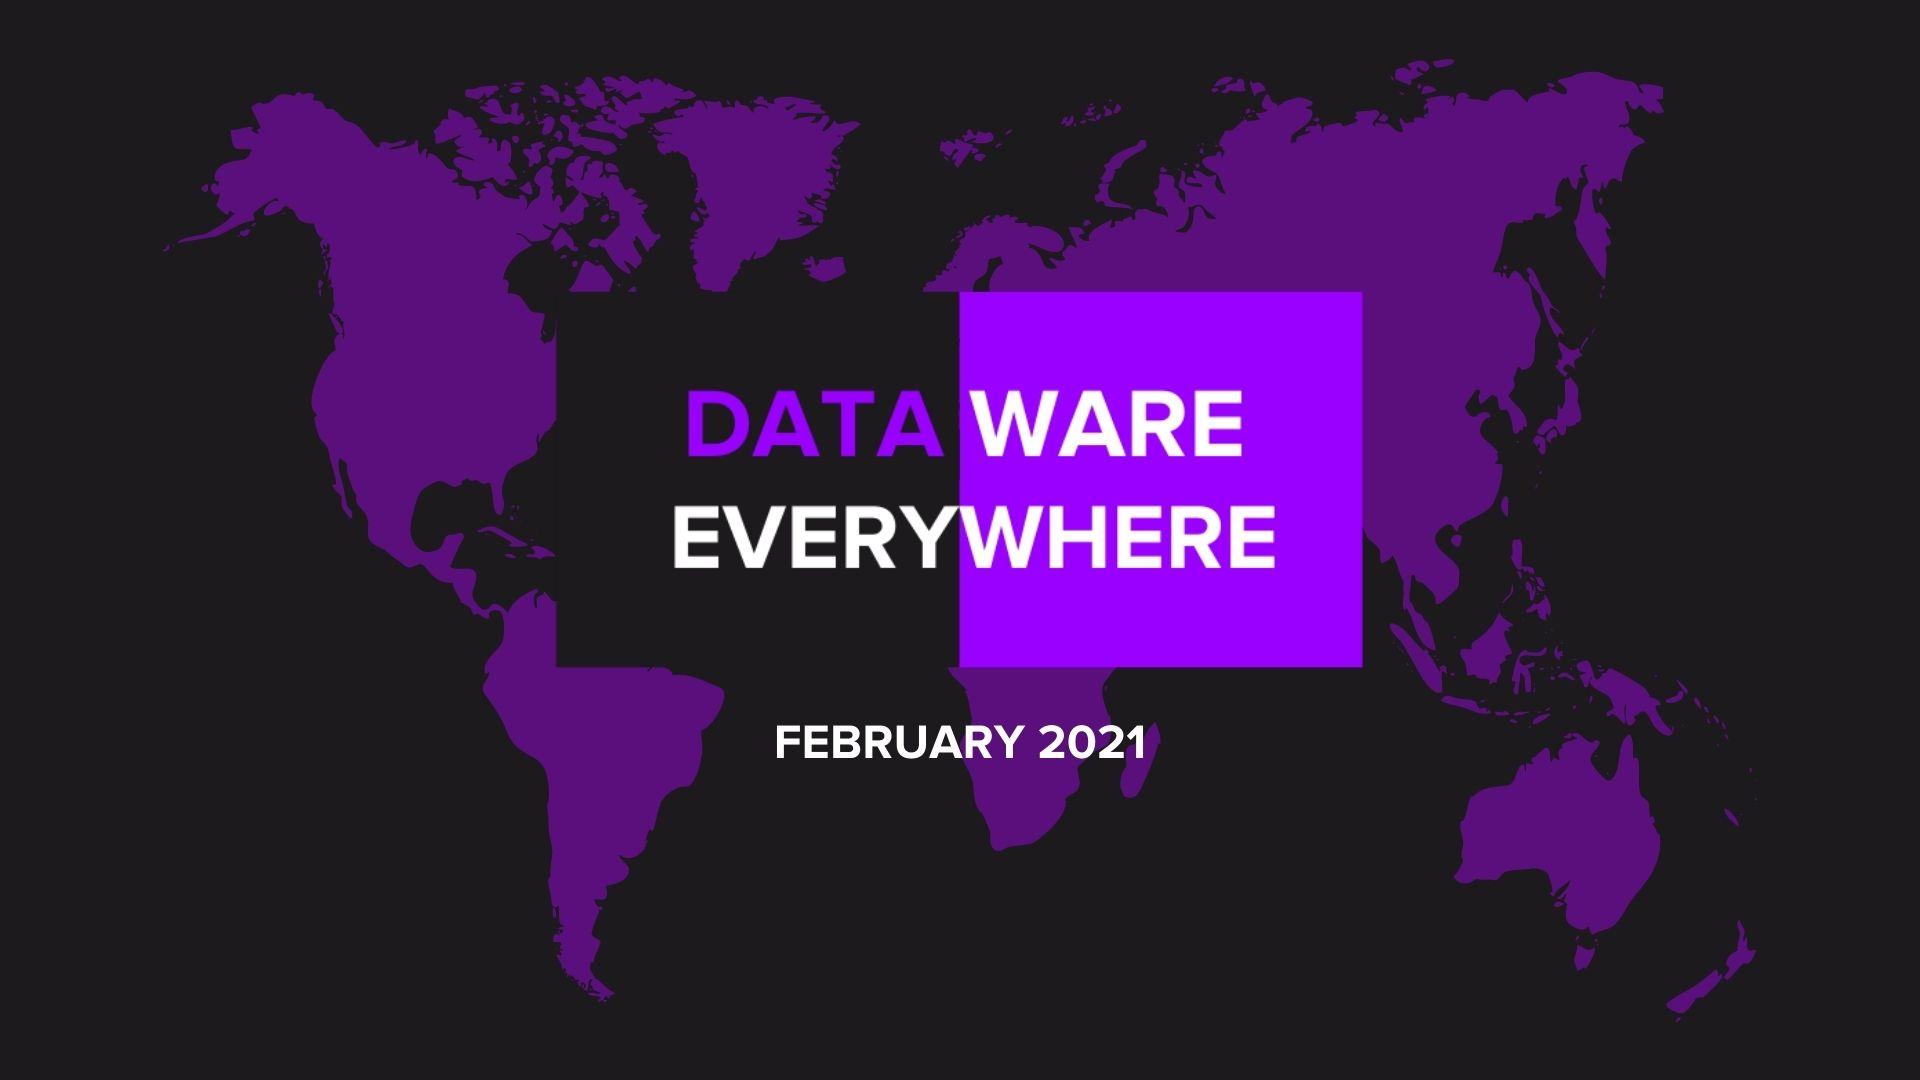 [Read] Dataware, Everywhere February 2021 Edition